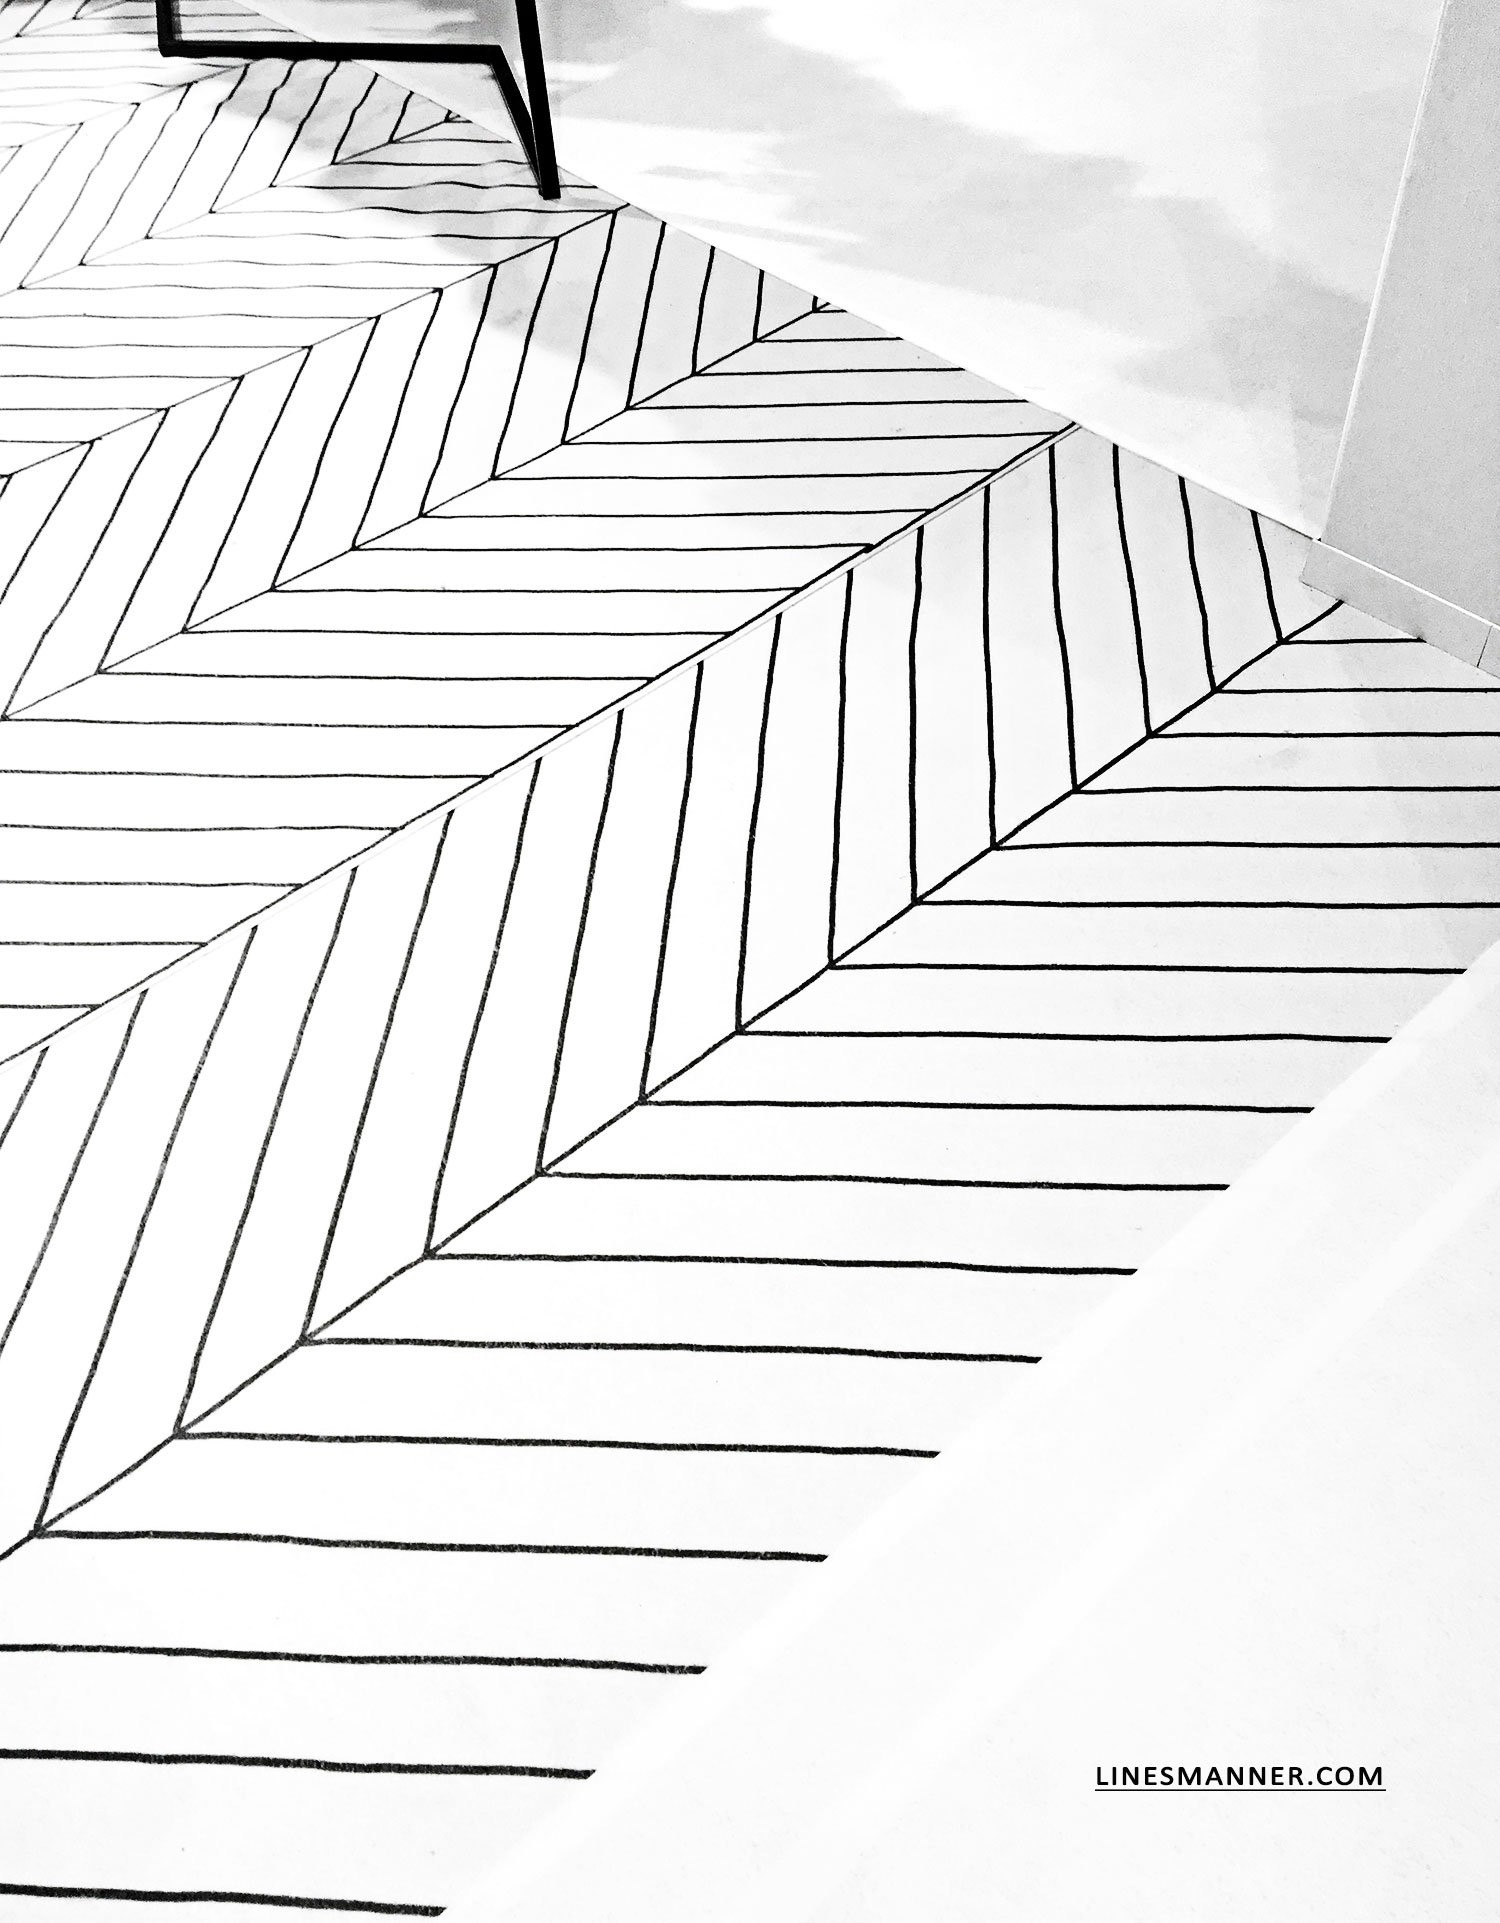 Lines-Manner-Who's_Next-Fashion-International-Show-Paris-Designers-Collection-Creators-Emerging_Designers-Independant-Eco_Fashion-Sustainable-Monochrome-Details-1